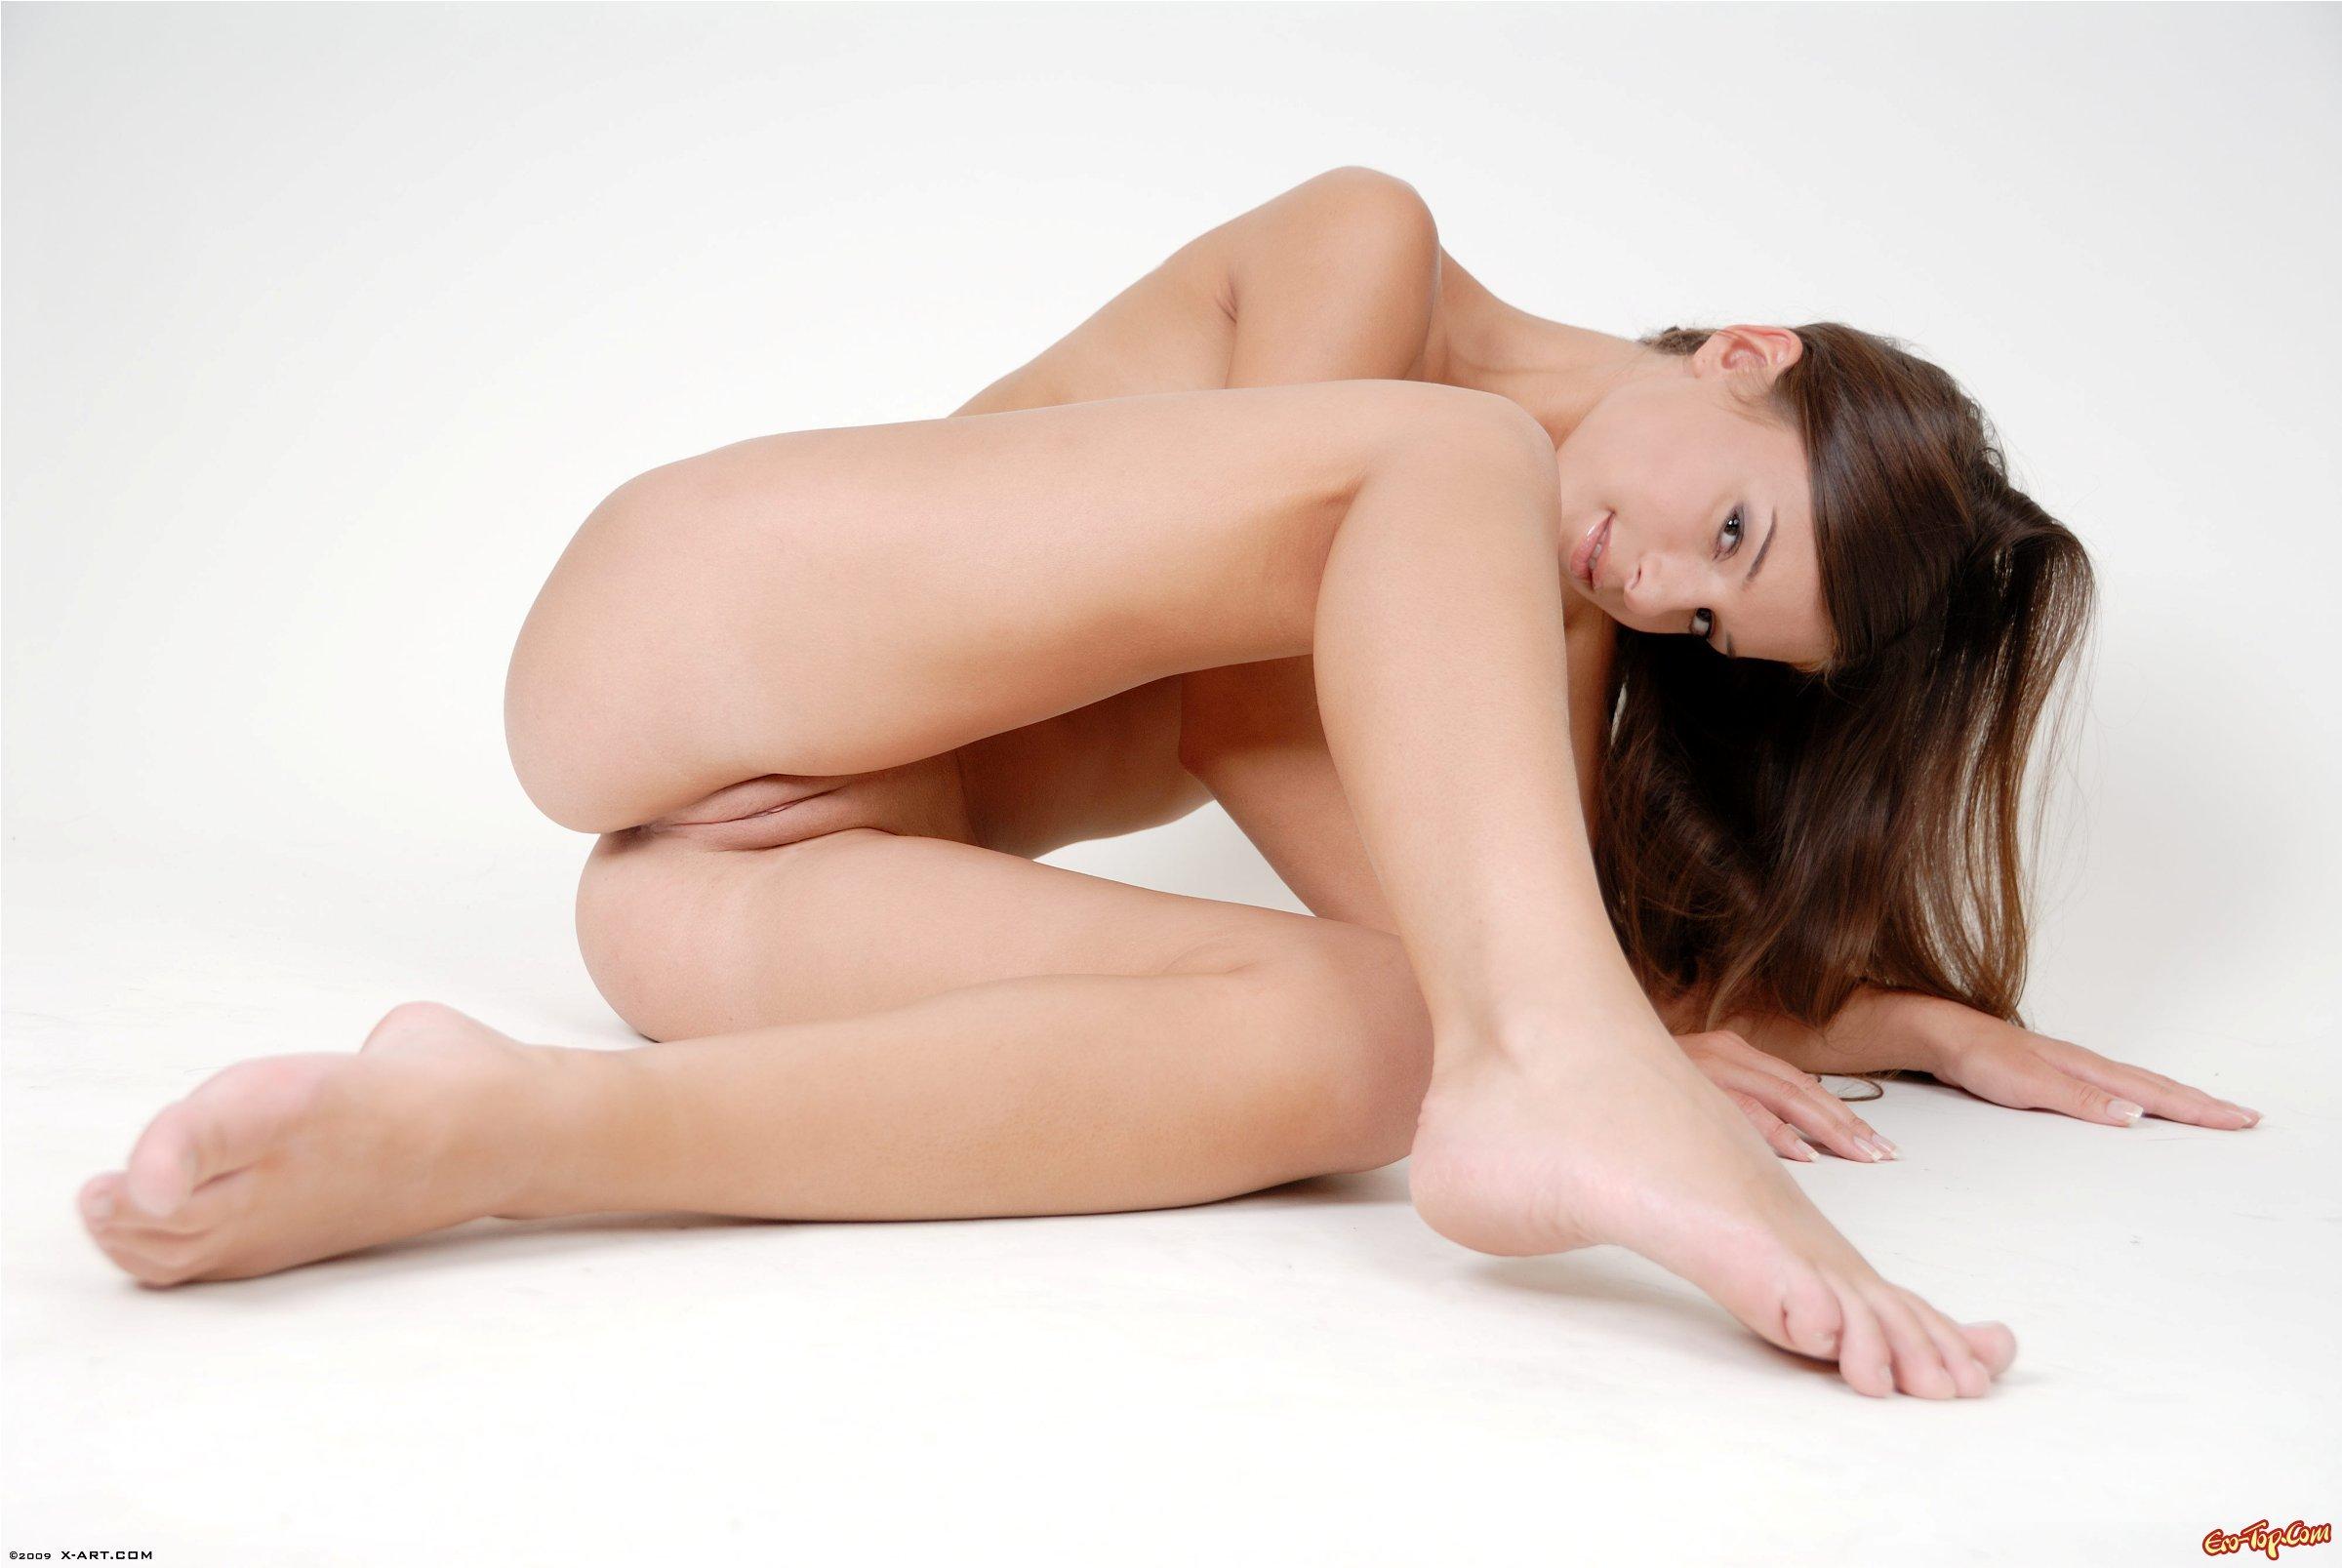 Free pixie hair erotic pics porn videos